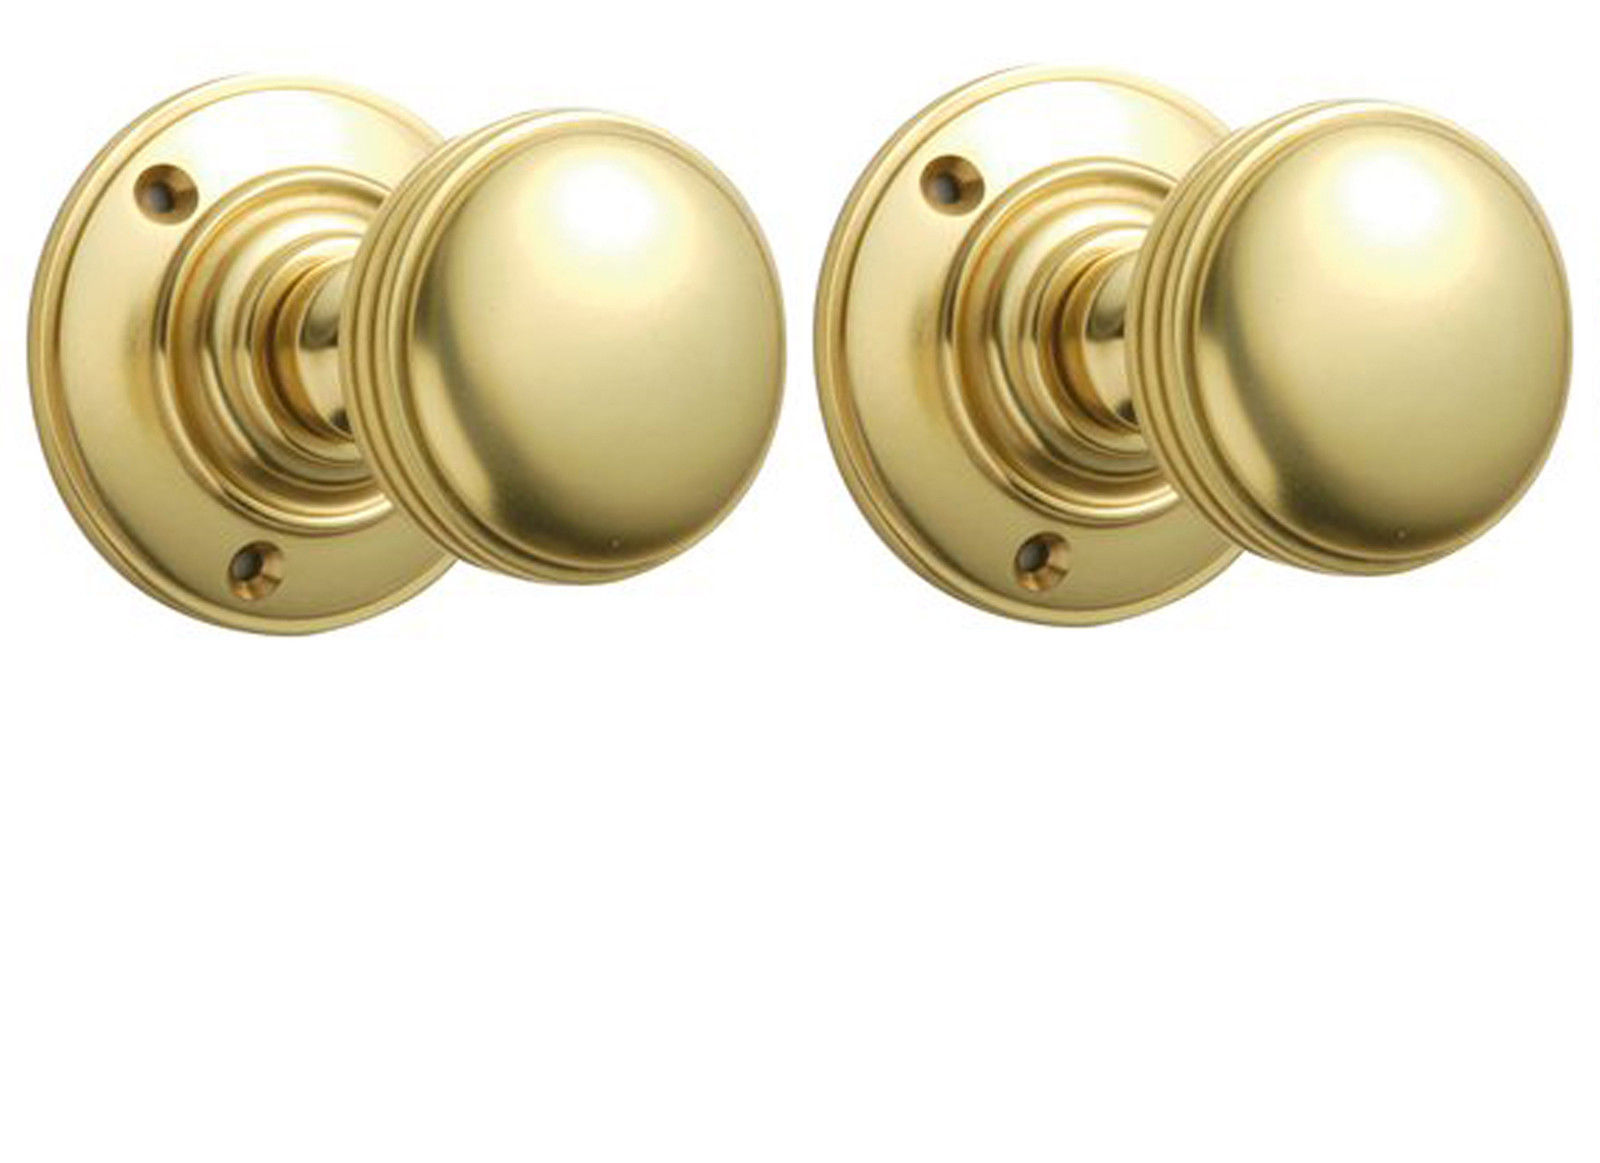 quality door knobs photo - 2